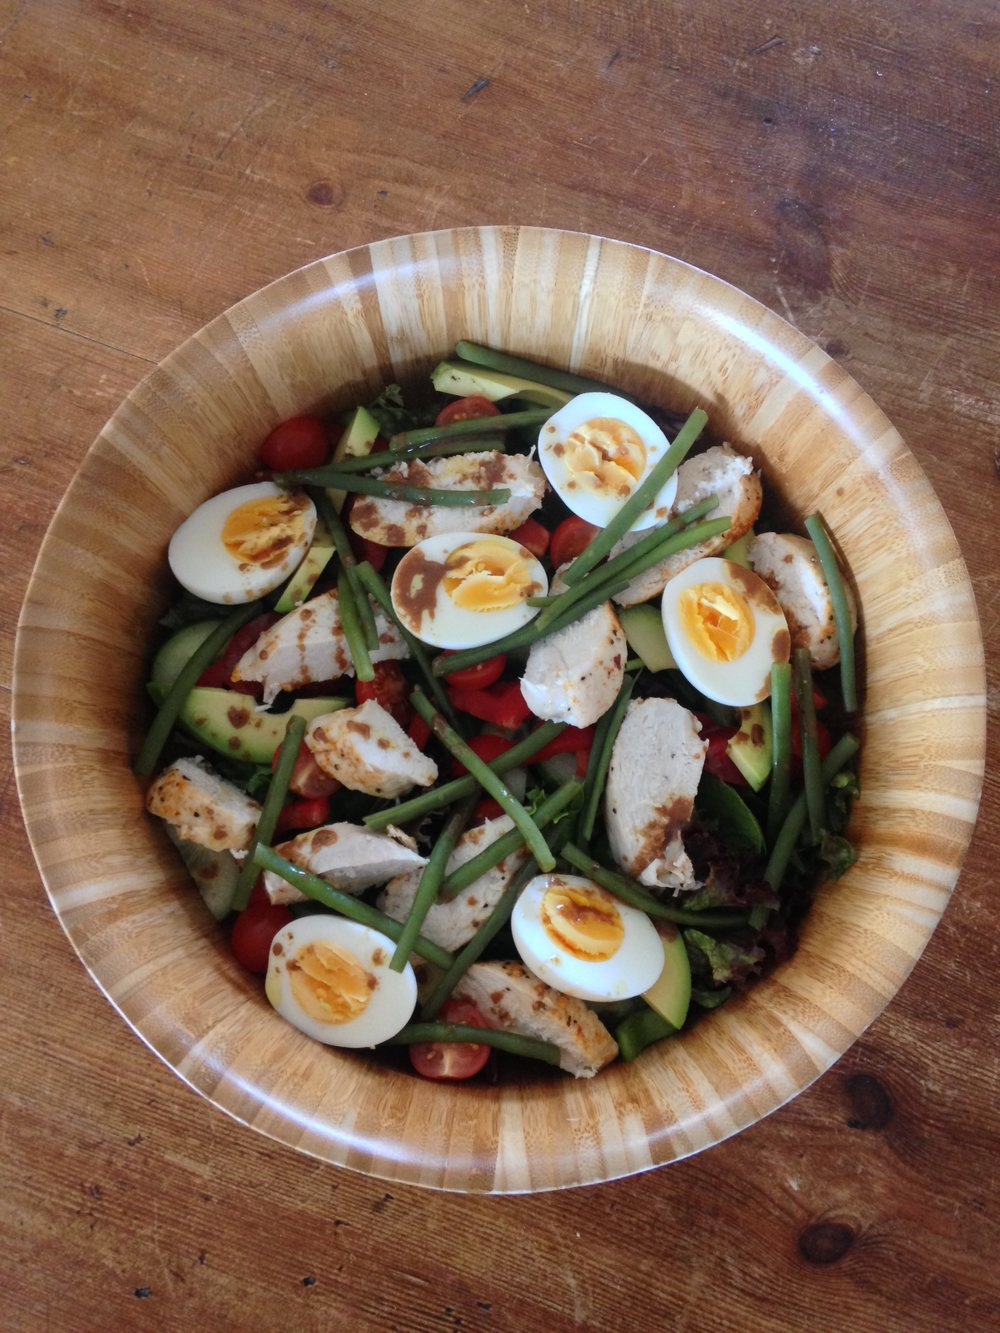 Warm roast chicken & Glenballyeamon egg salad with balsamic dressing.